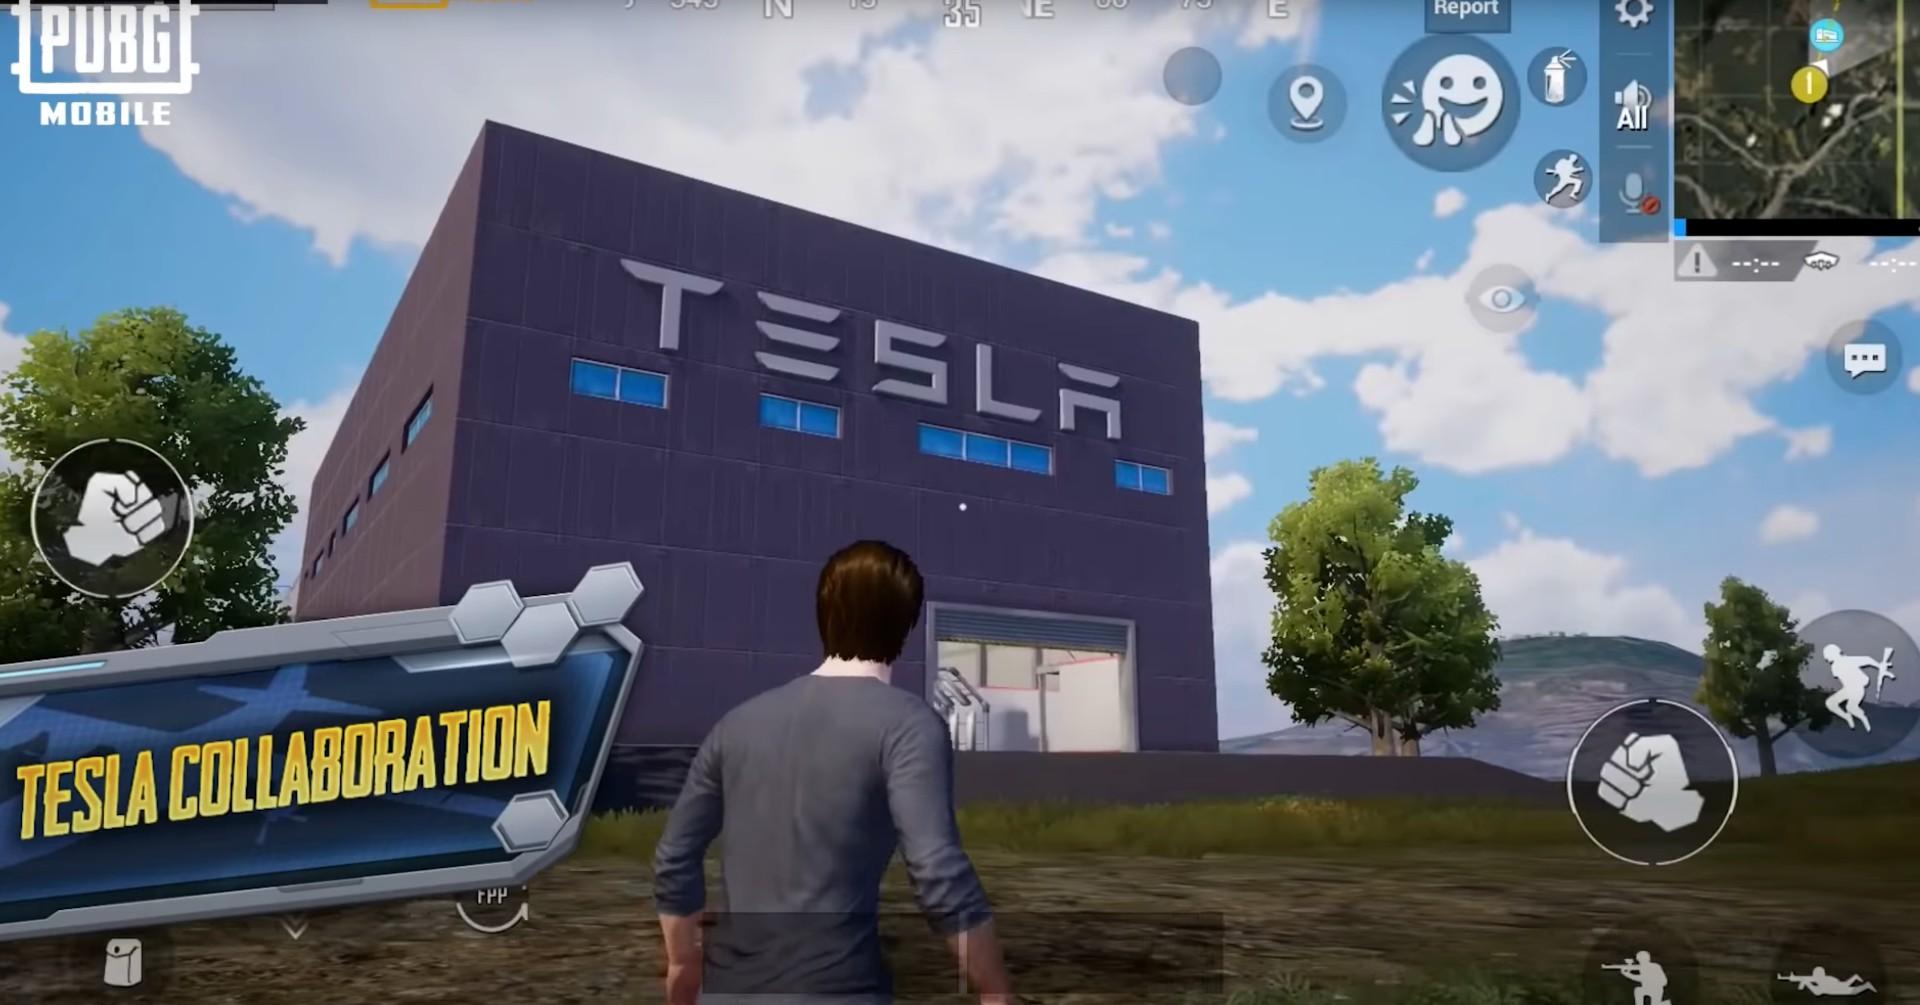 tesla-gigafactory-pubg-mobile-video-game